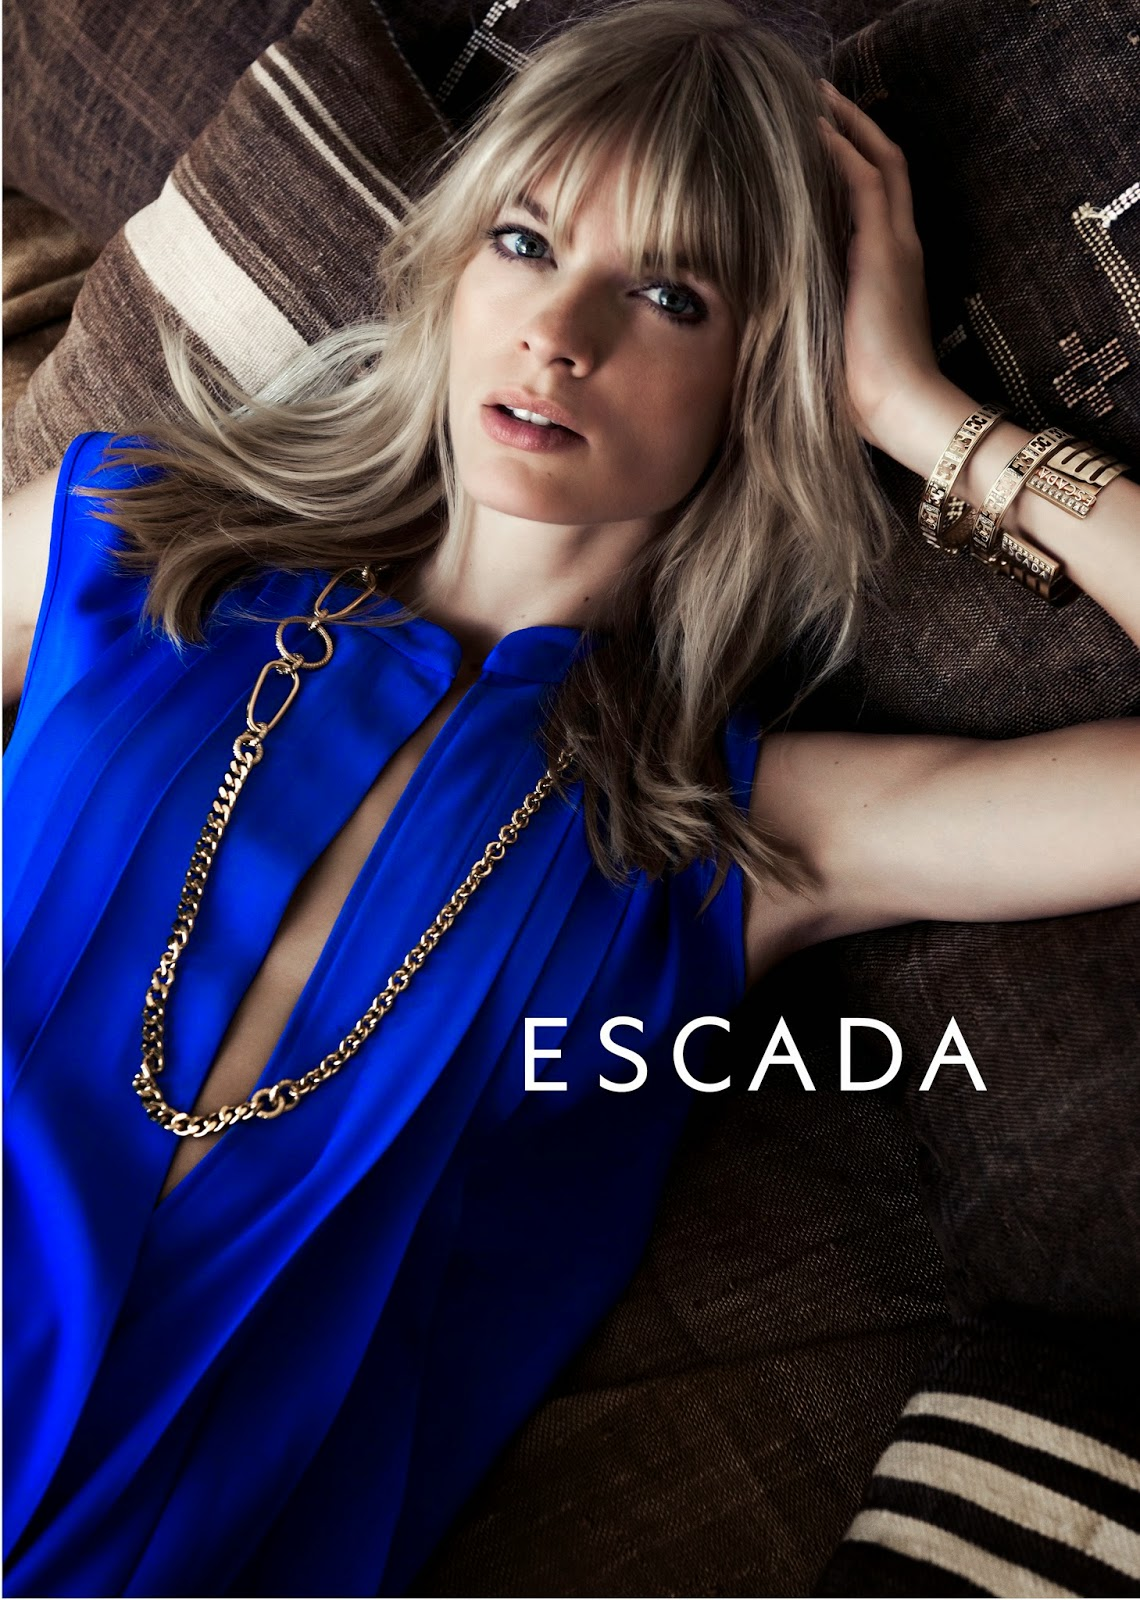 Escada, relojes, relojería, moda femenina., moda, swiss made, elegancia, exótico, sexy, Fall 2014, Fall Winter, be divinity, joyas, Alta Bisutería,